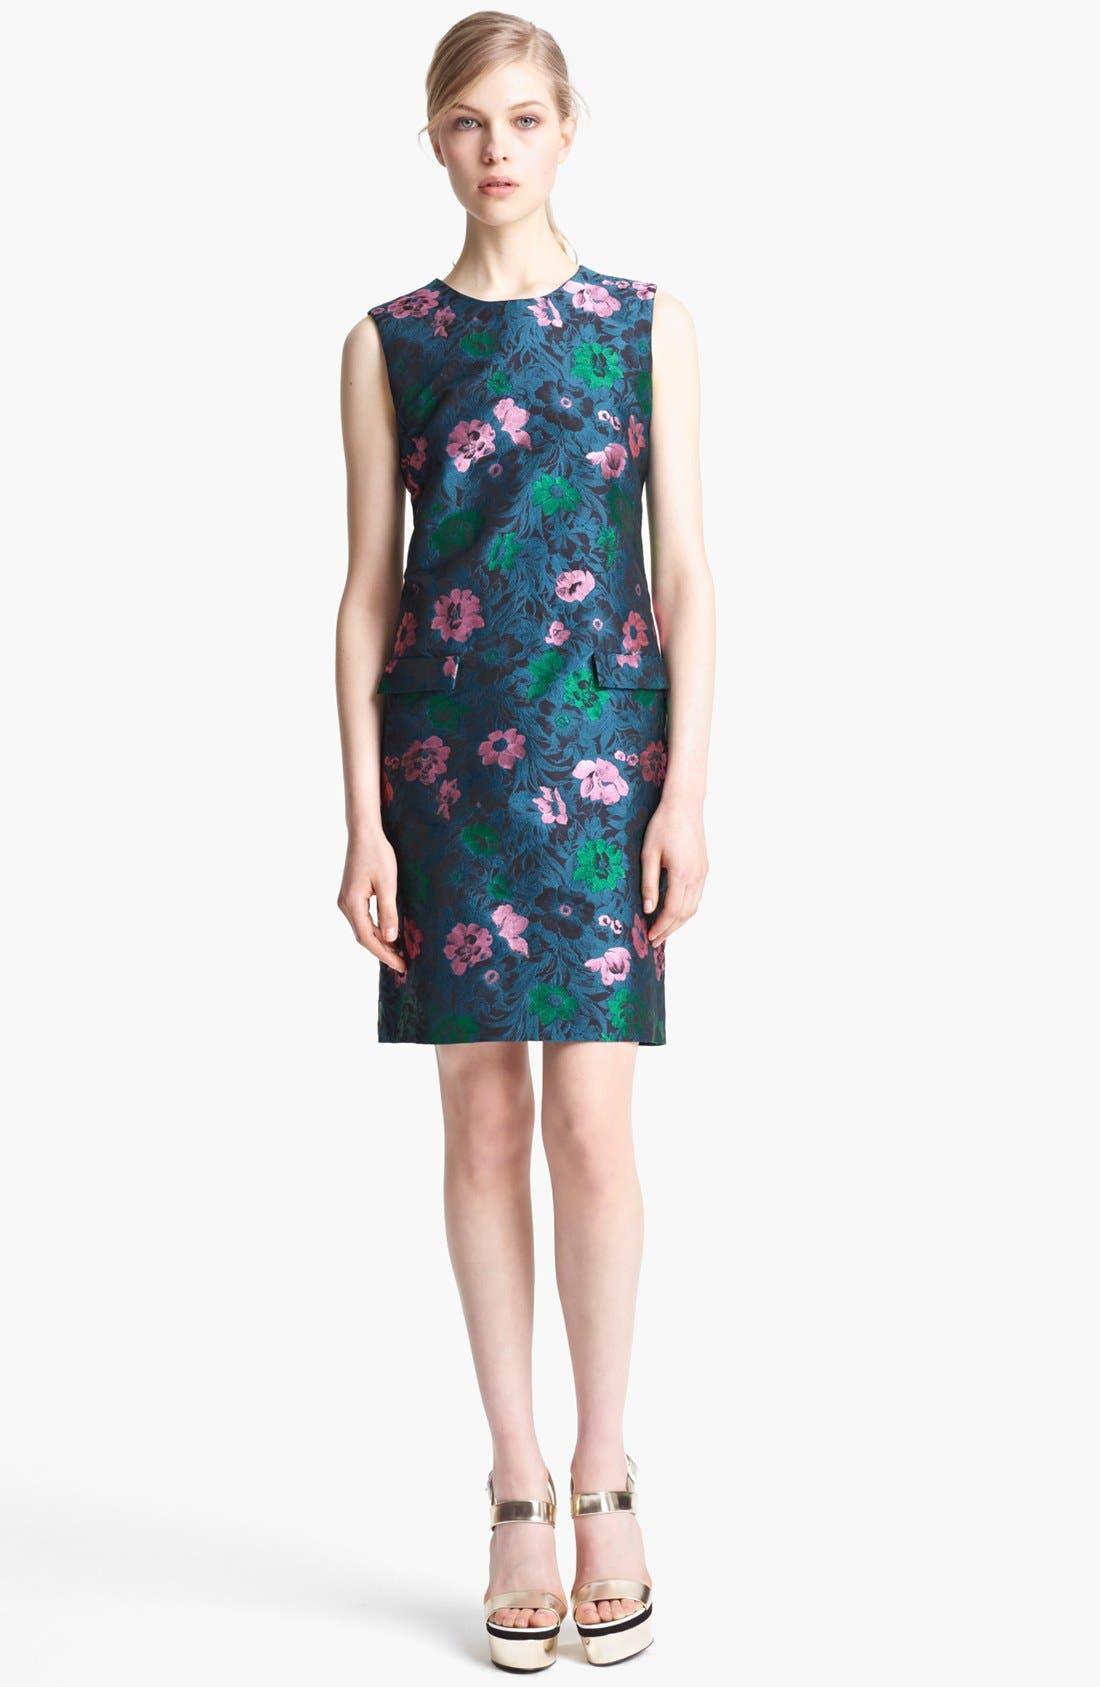 Alternate Image 1 Selected - Erdem Sleeveless Floral Jacquard Shift Dress